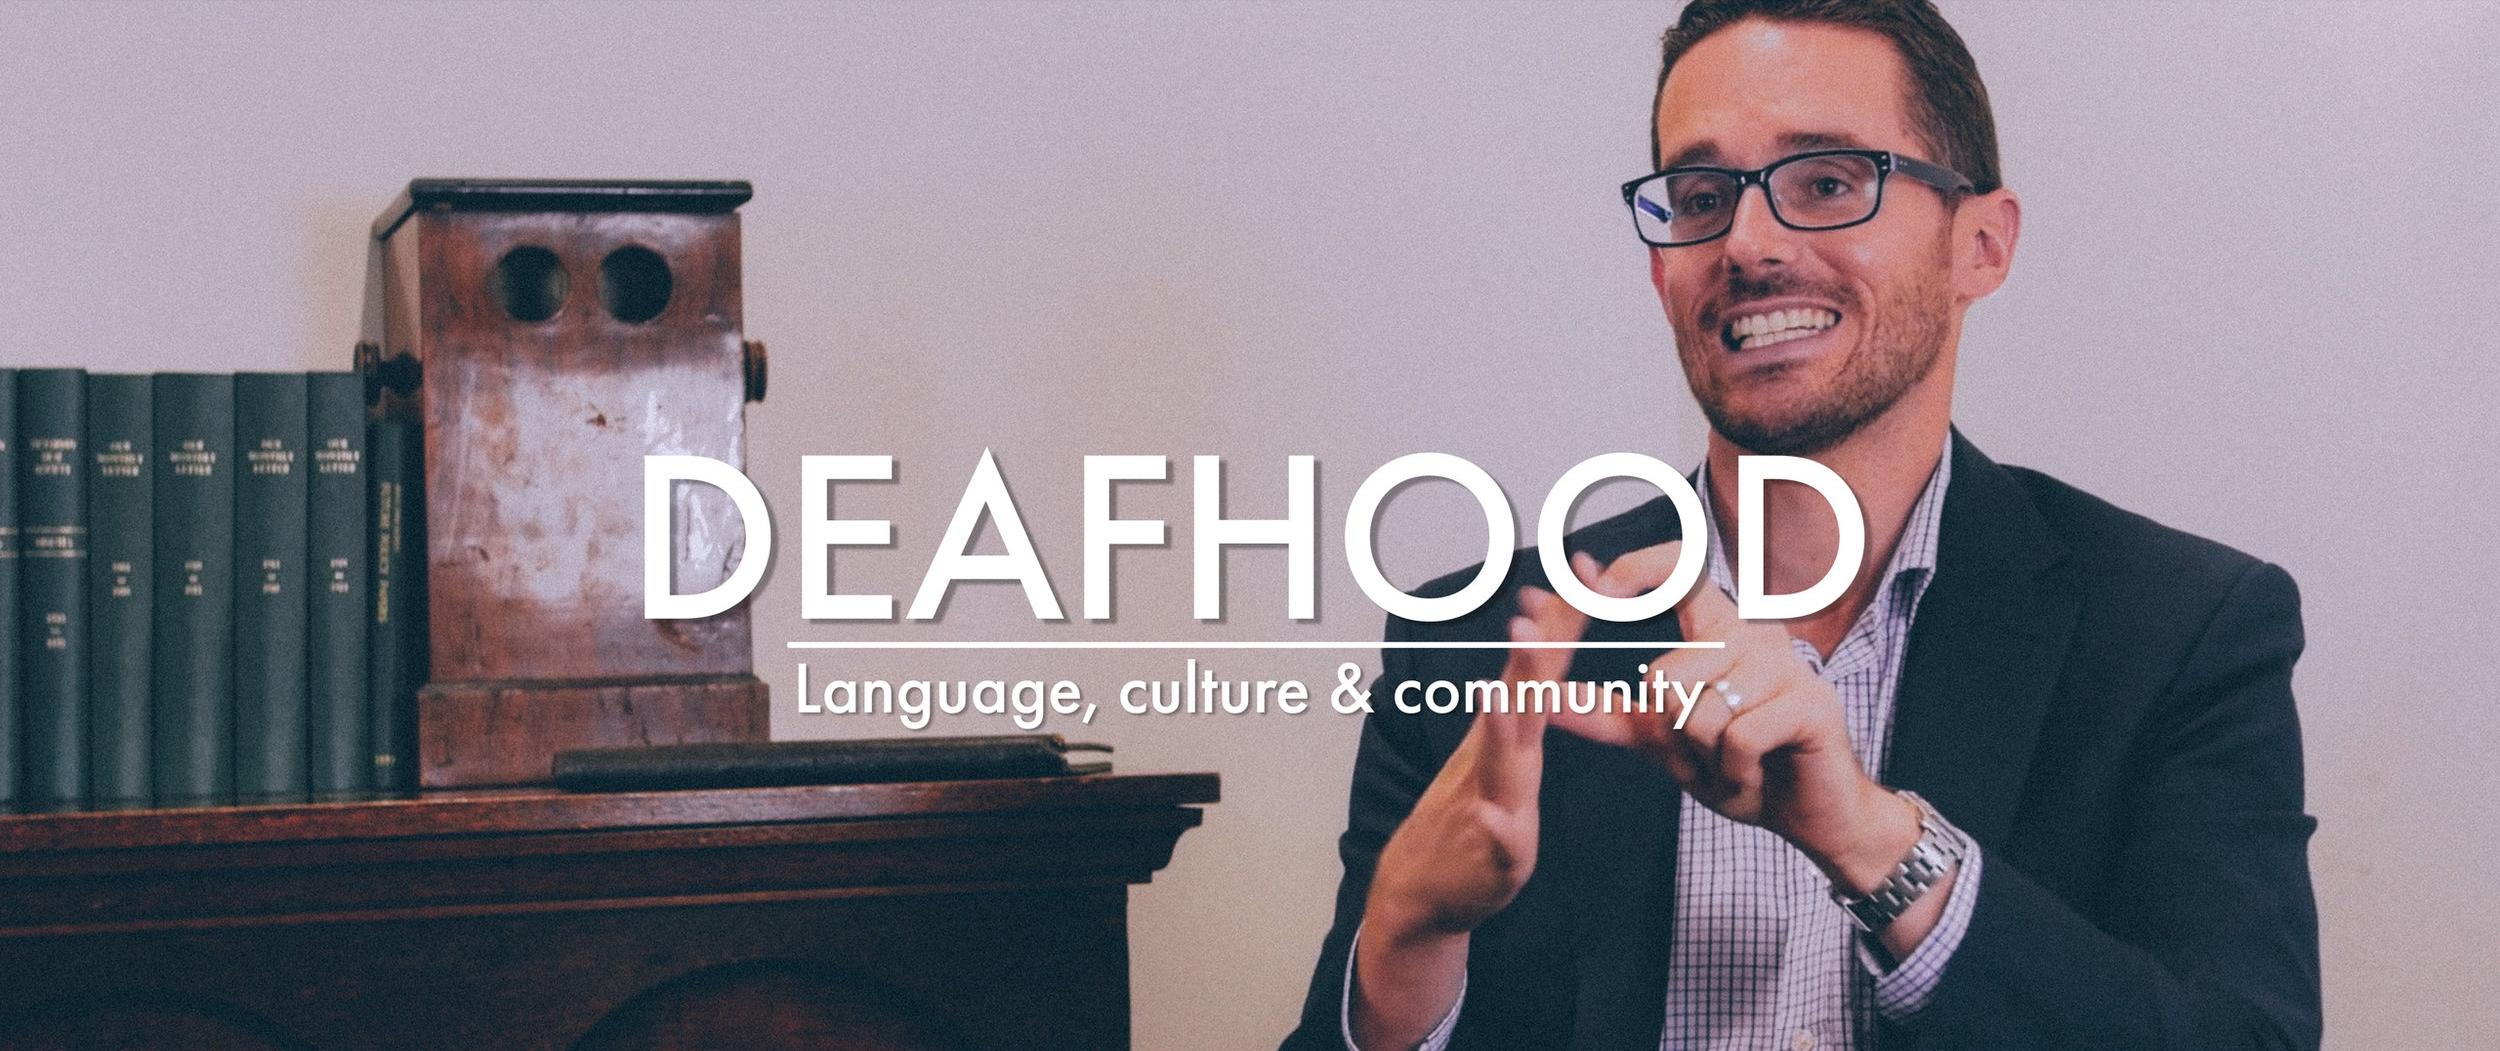 deafhood.jpg